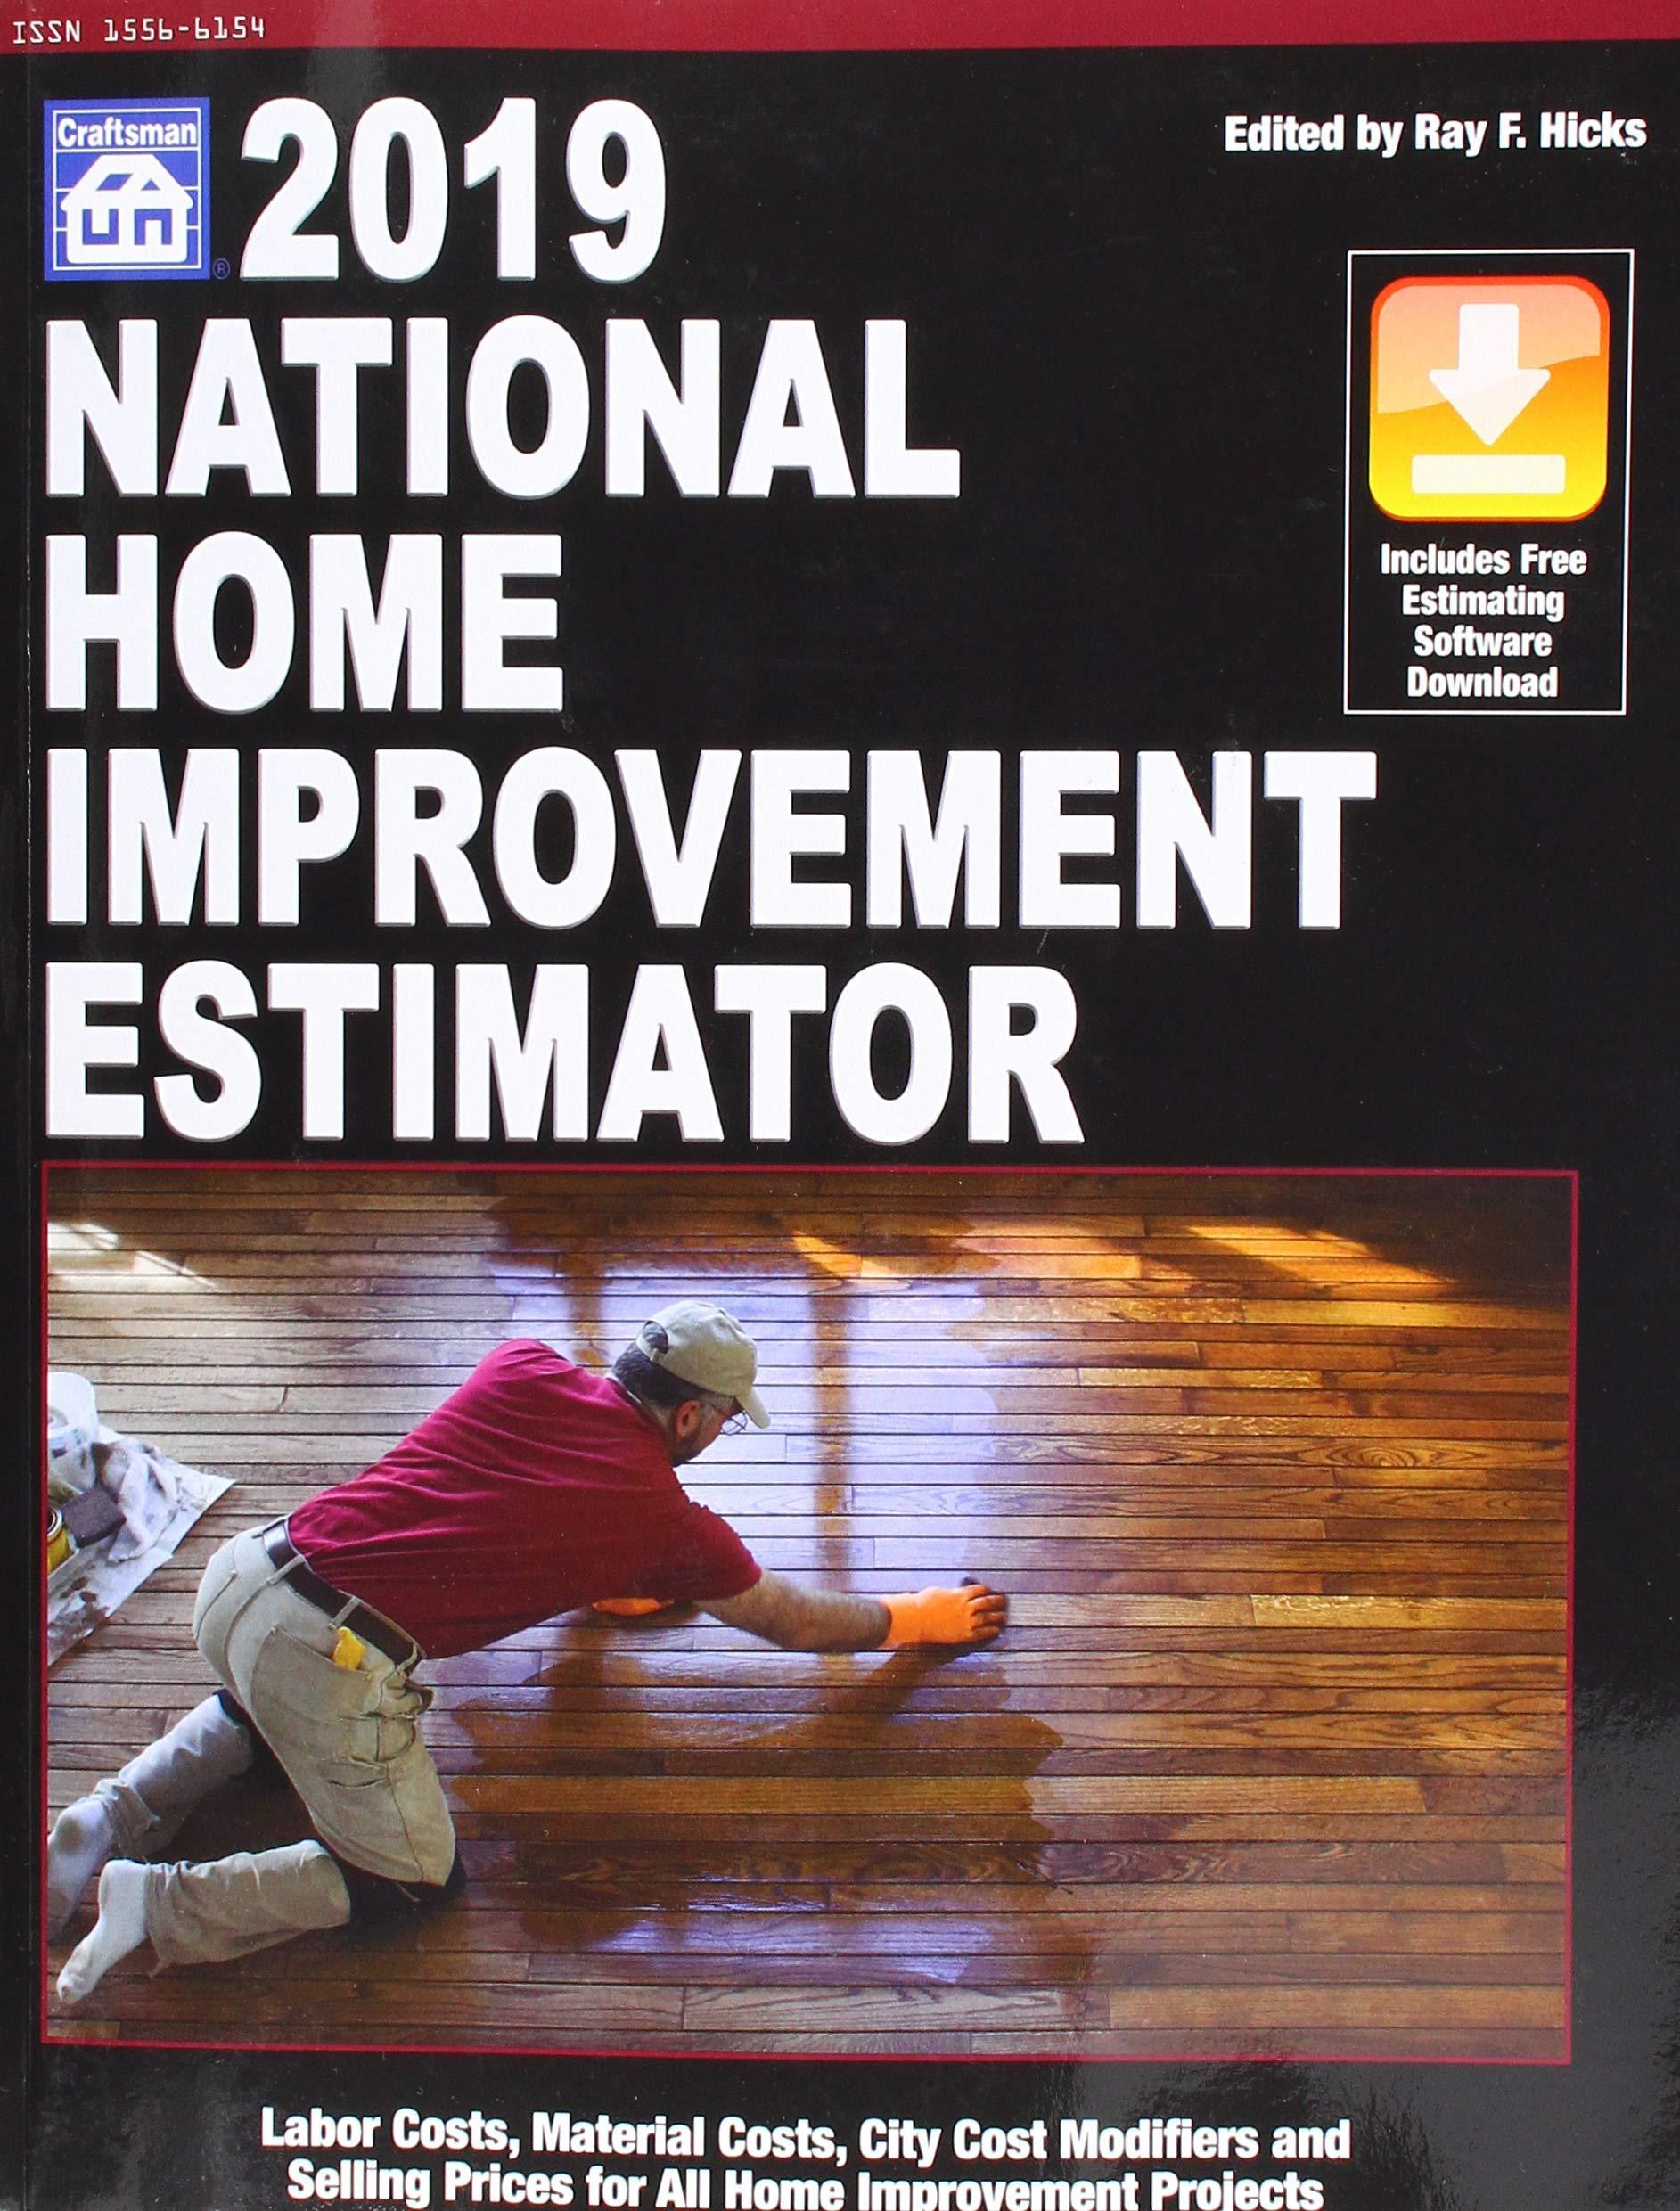 National Home Improvement Estimator 2019